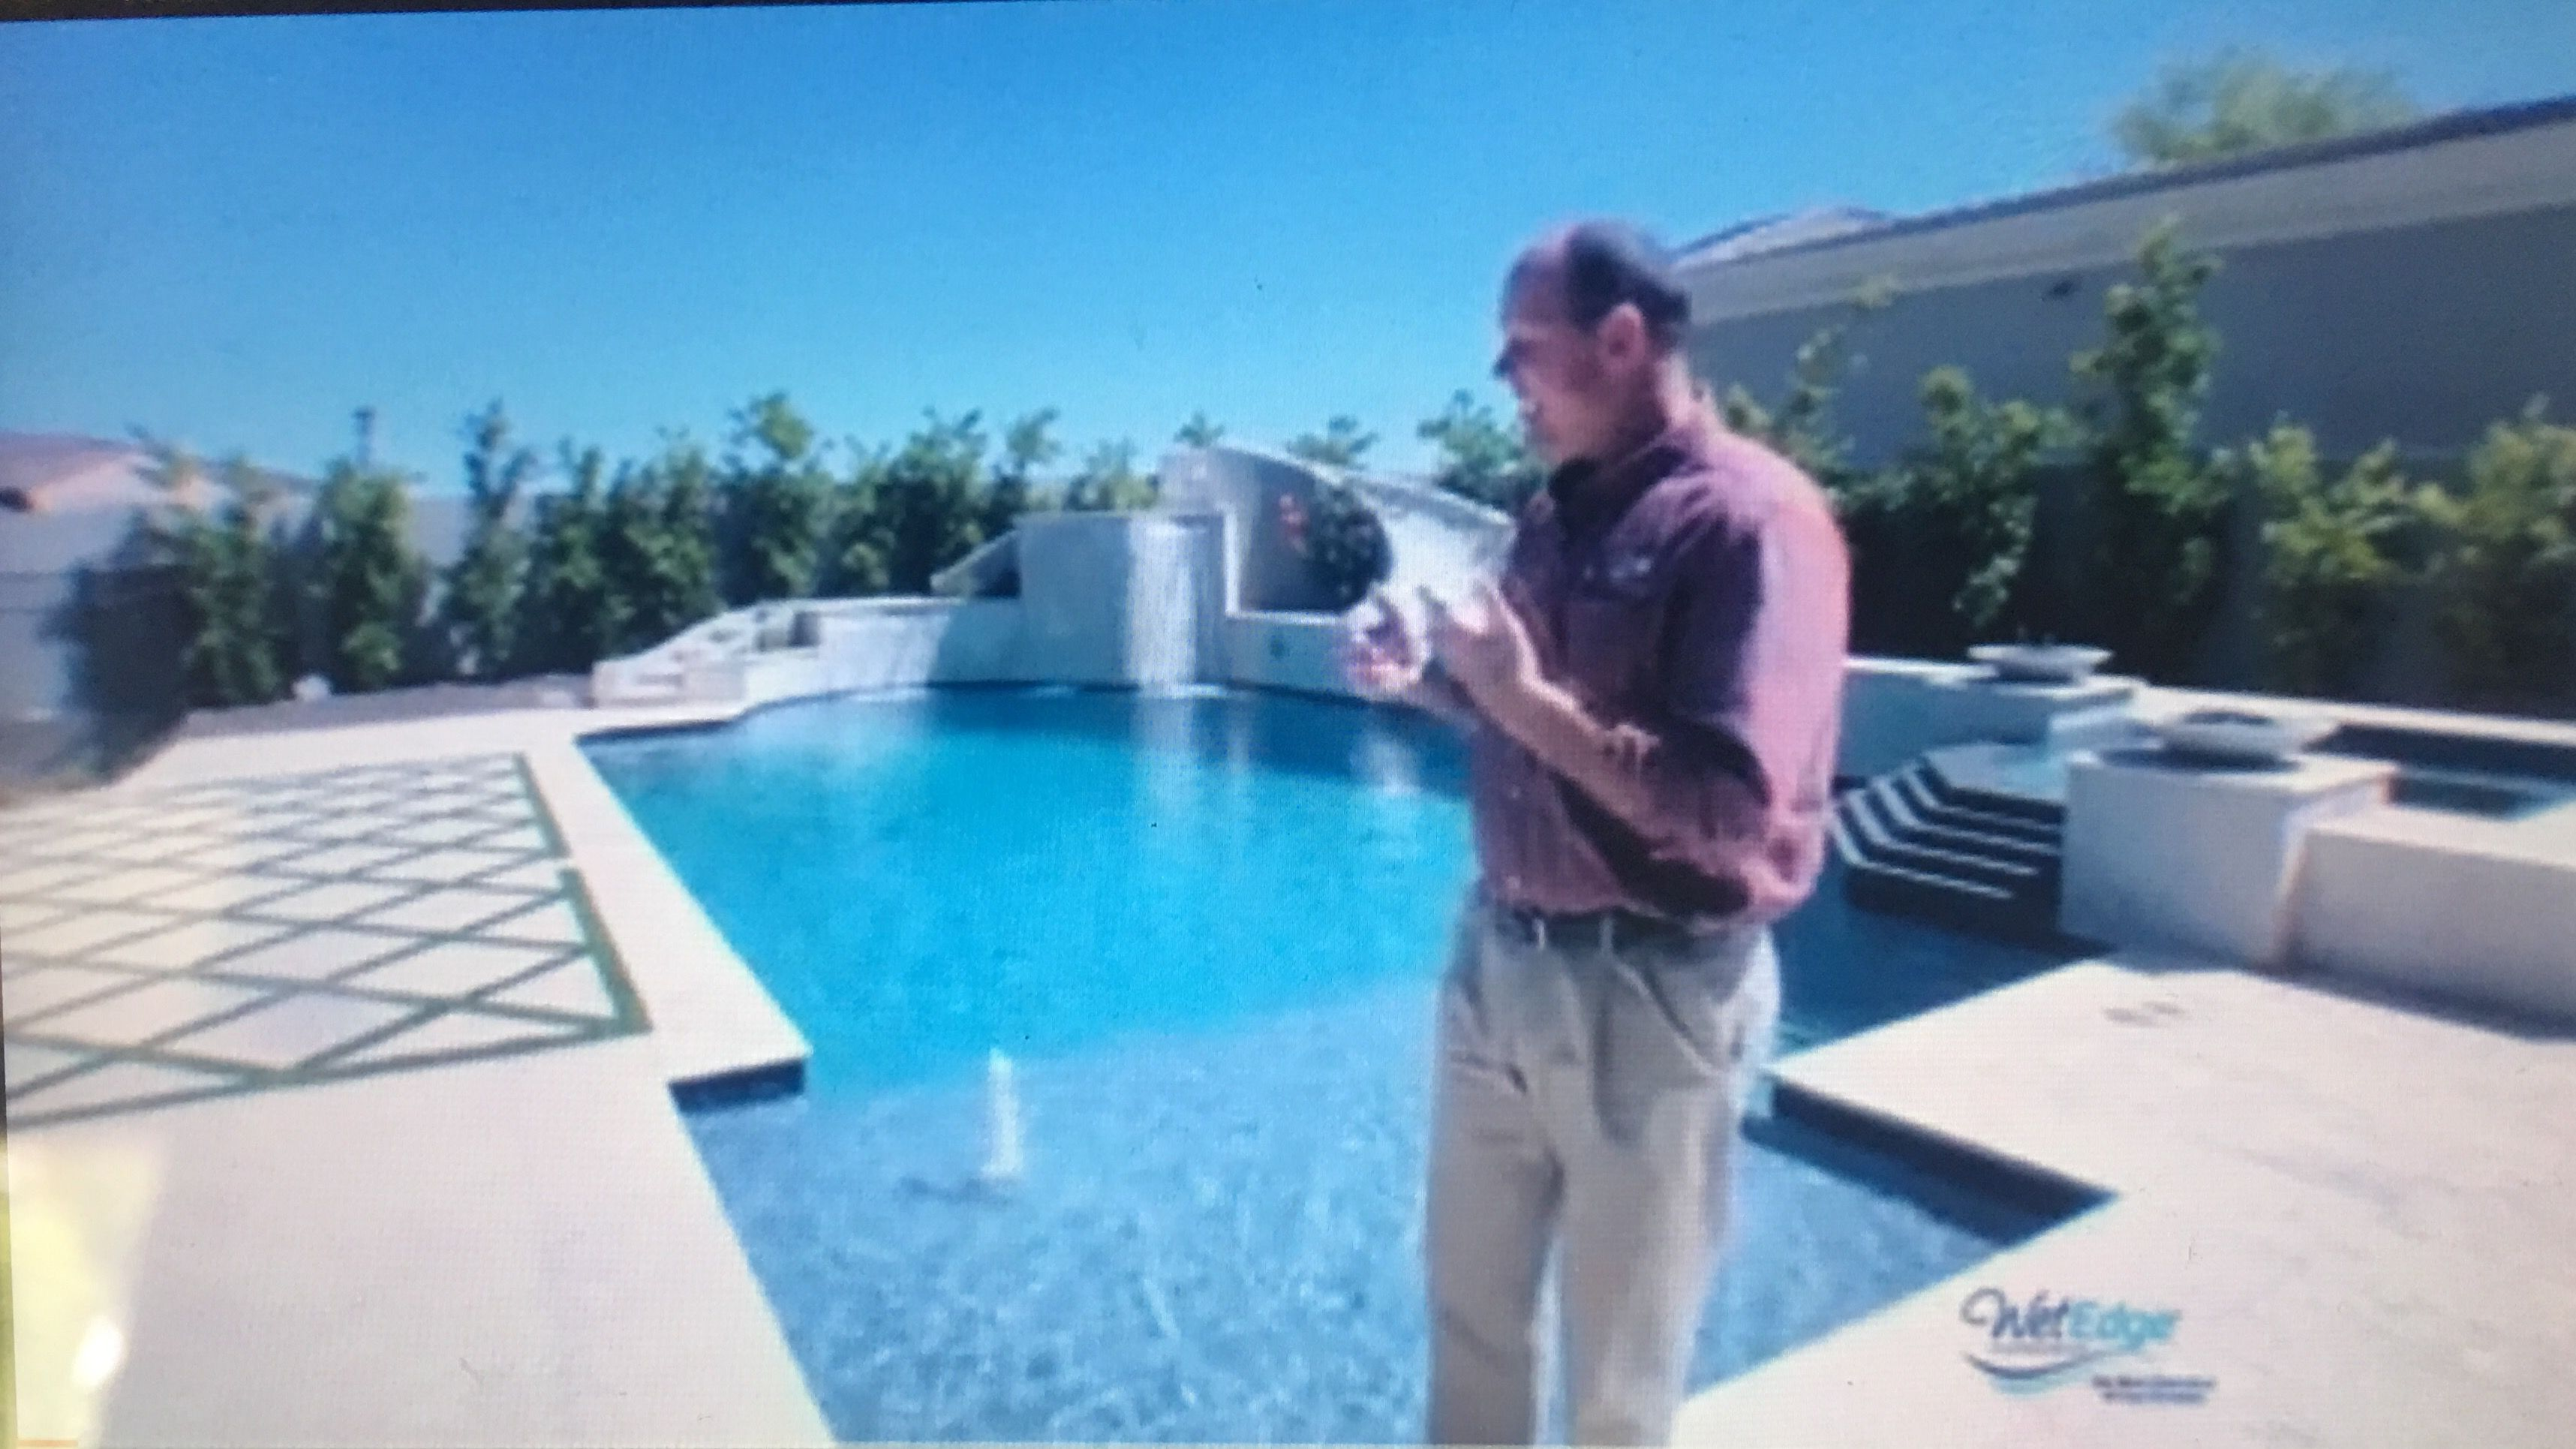 Pool W Diamond Pattern Concrete Slabs W Grass Between